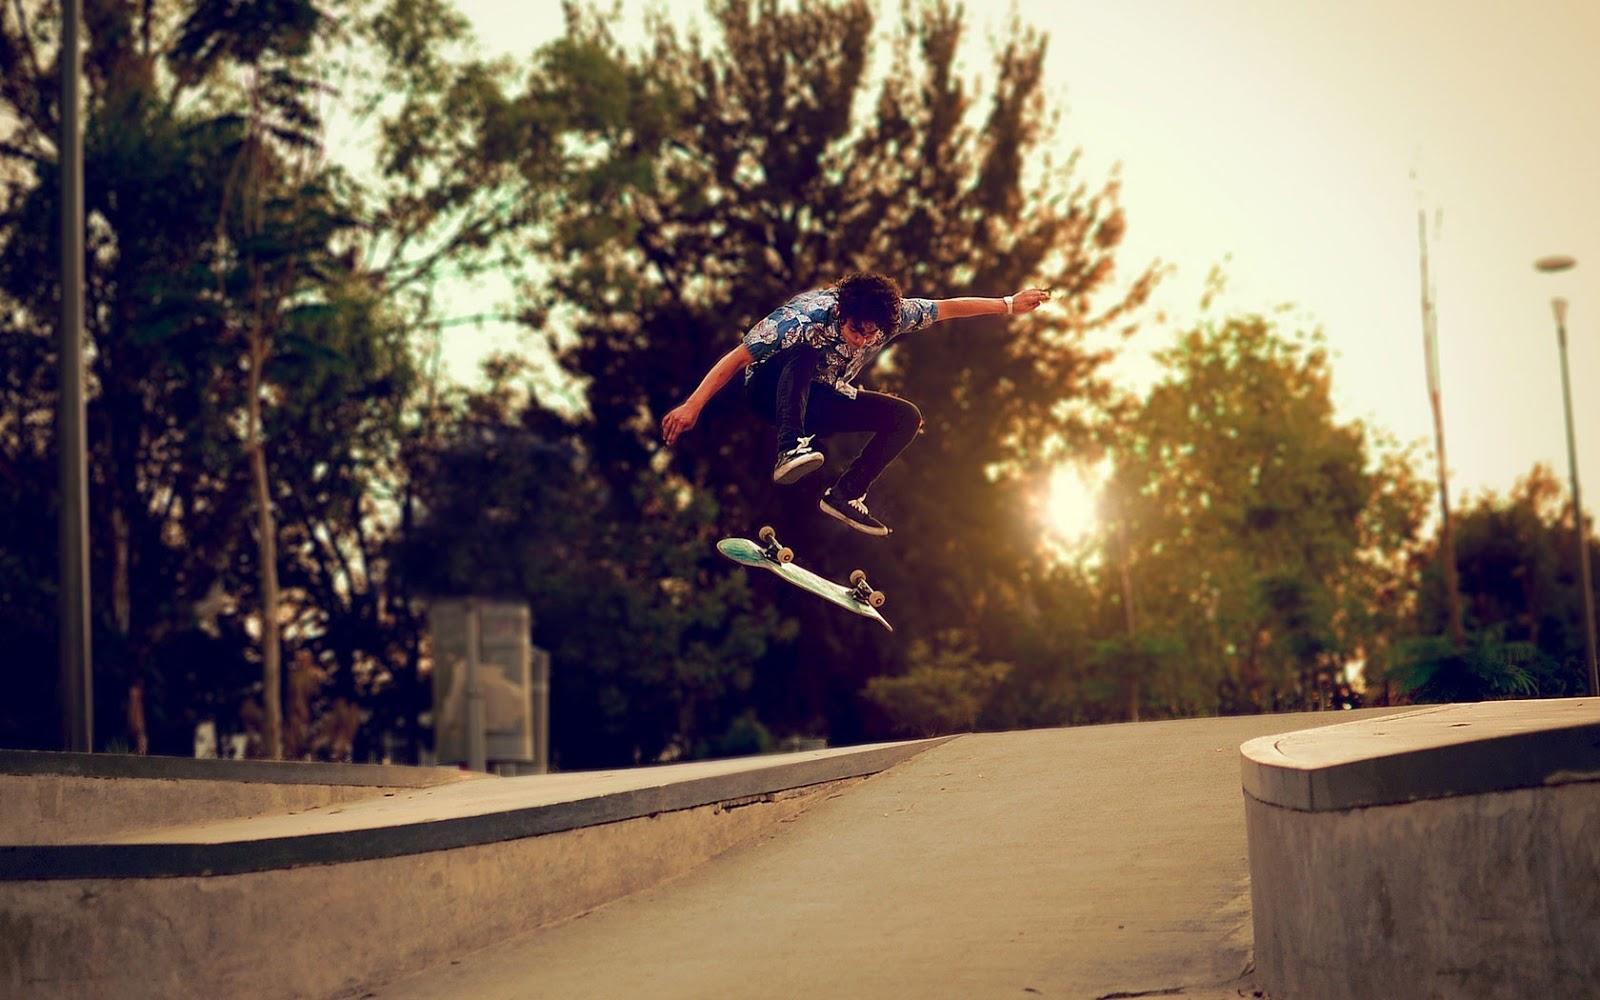 wallpapers hd for mac Skateboarding Wallpaper HD 1600x1000